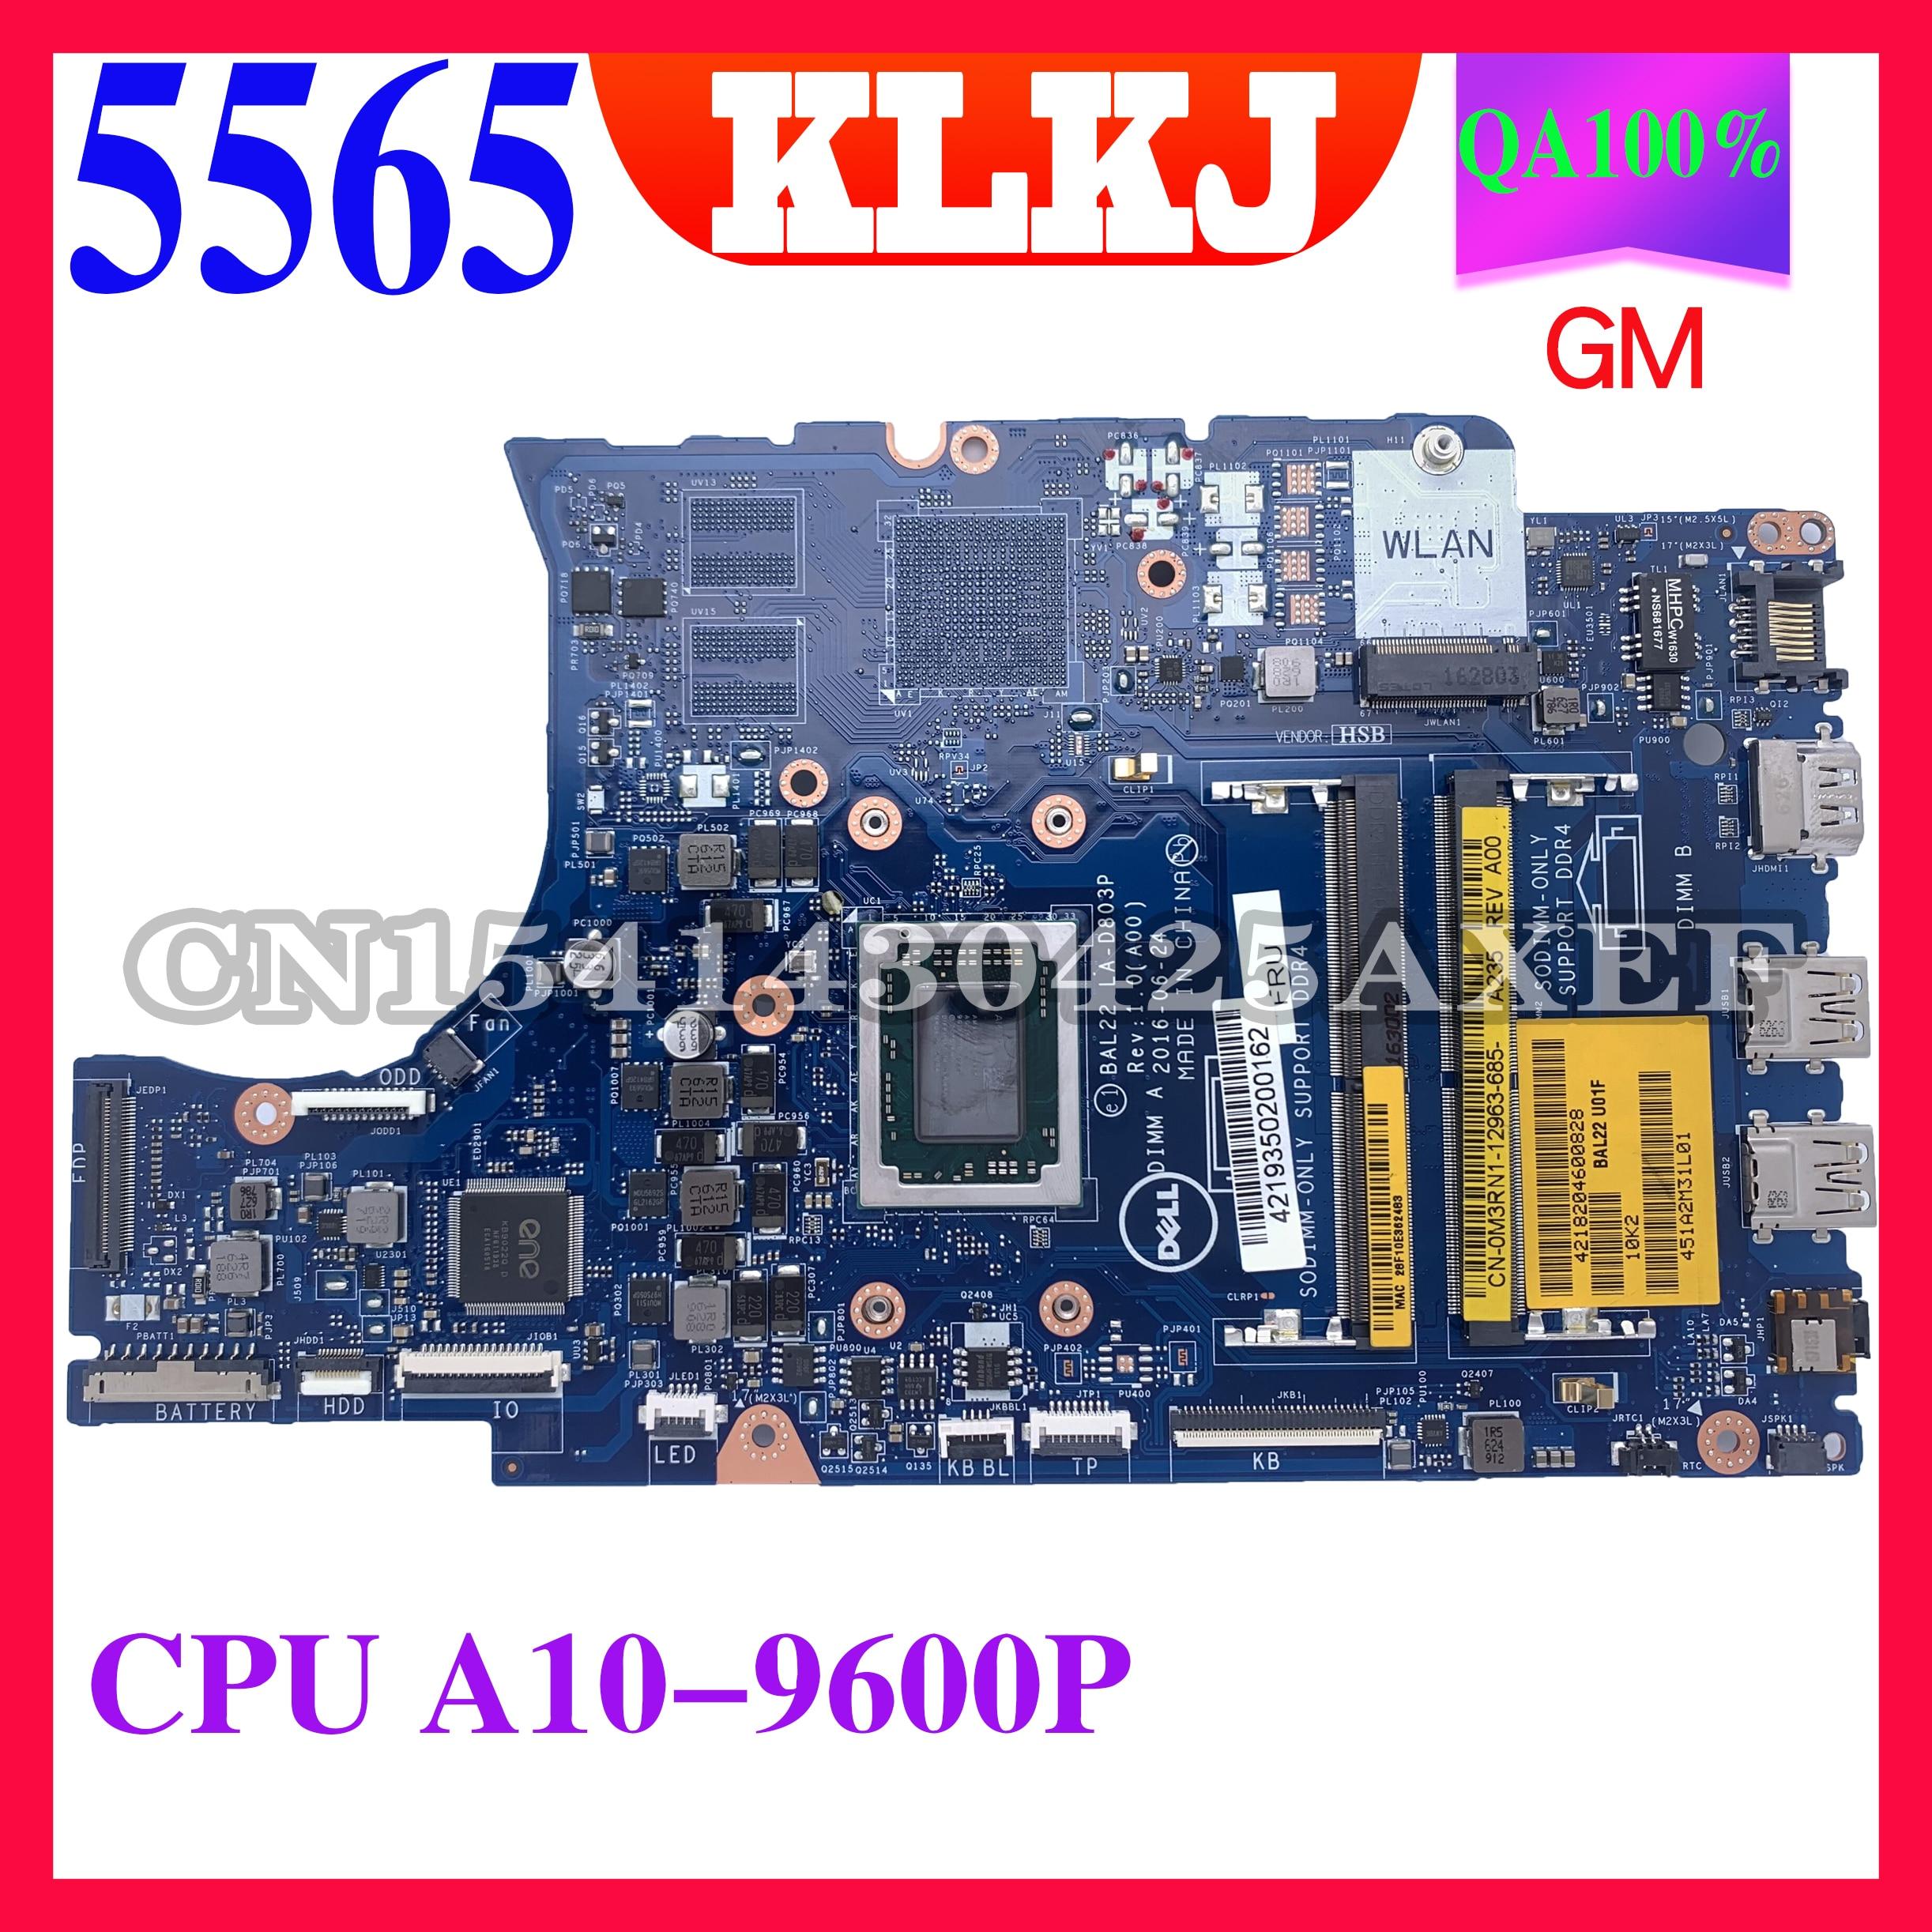 KLKJ LA-D803P материнская плата для ноутбука Dell Inspiron 15-5565 оригинальная материнская плата A10-9600P Процессор GM